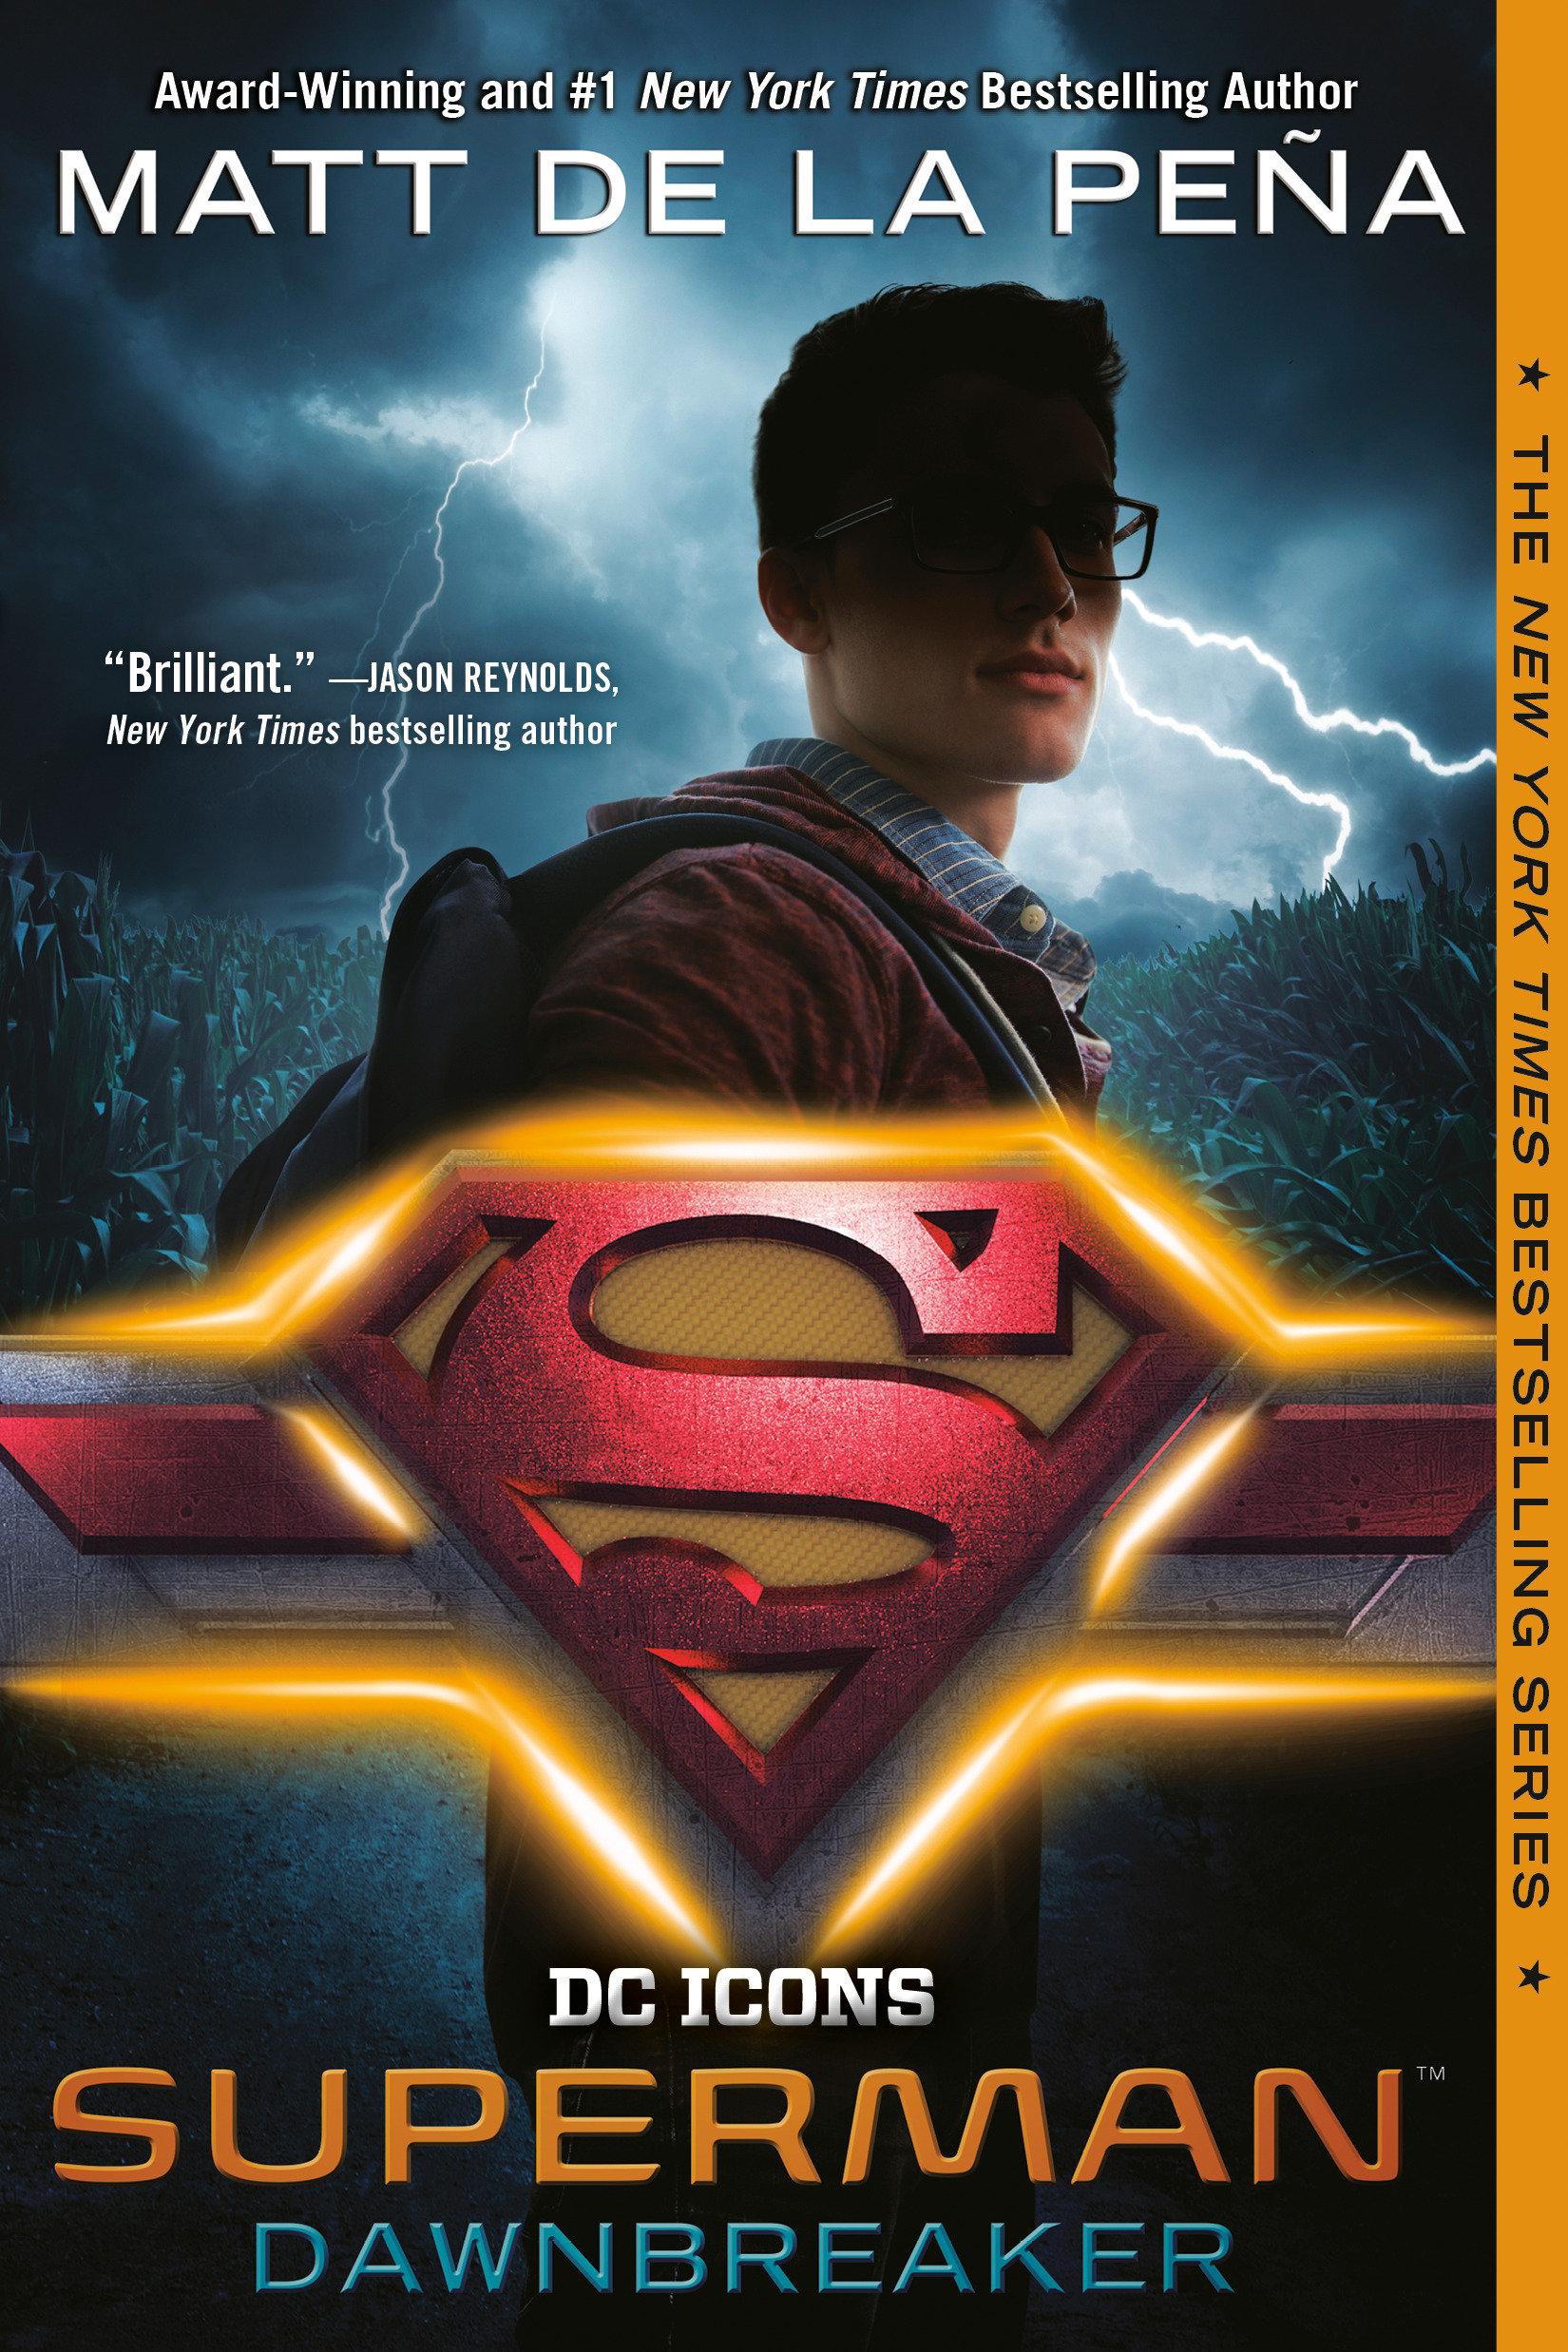 Superman dawnbreaker cover image